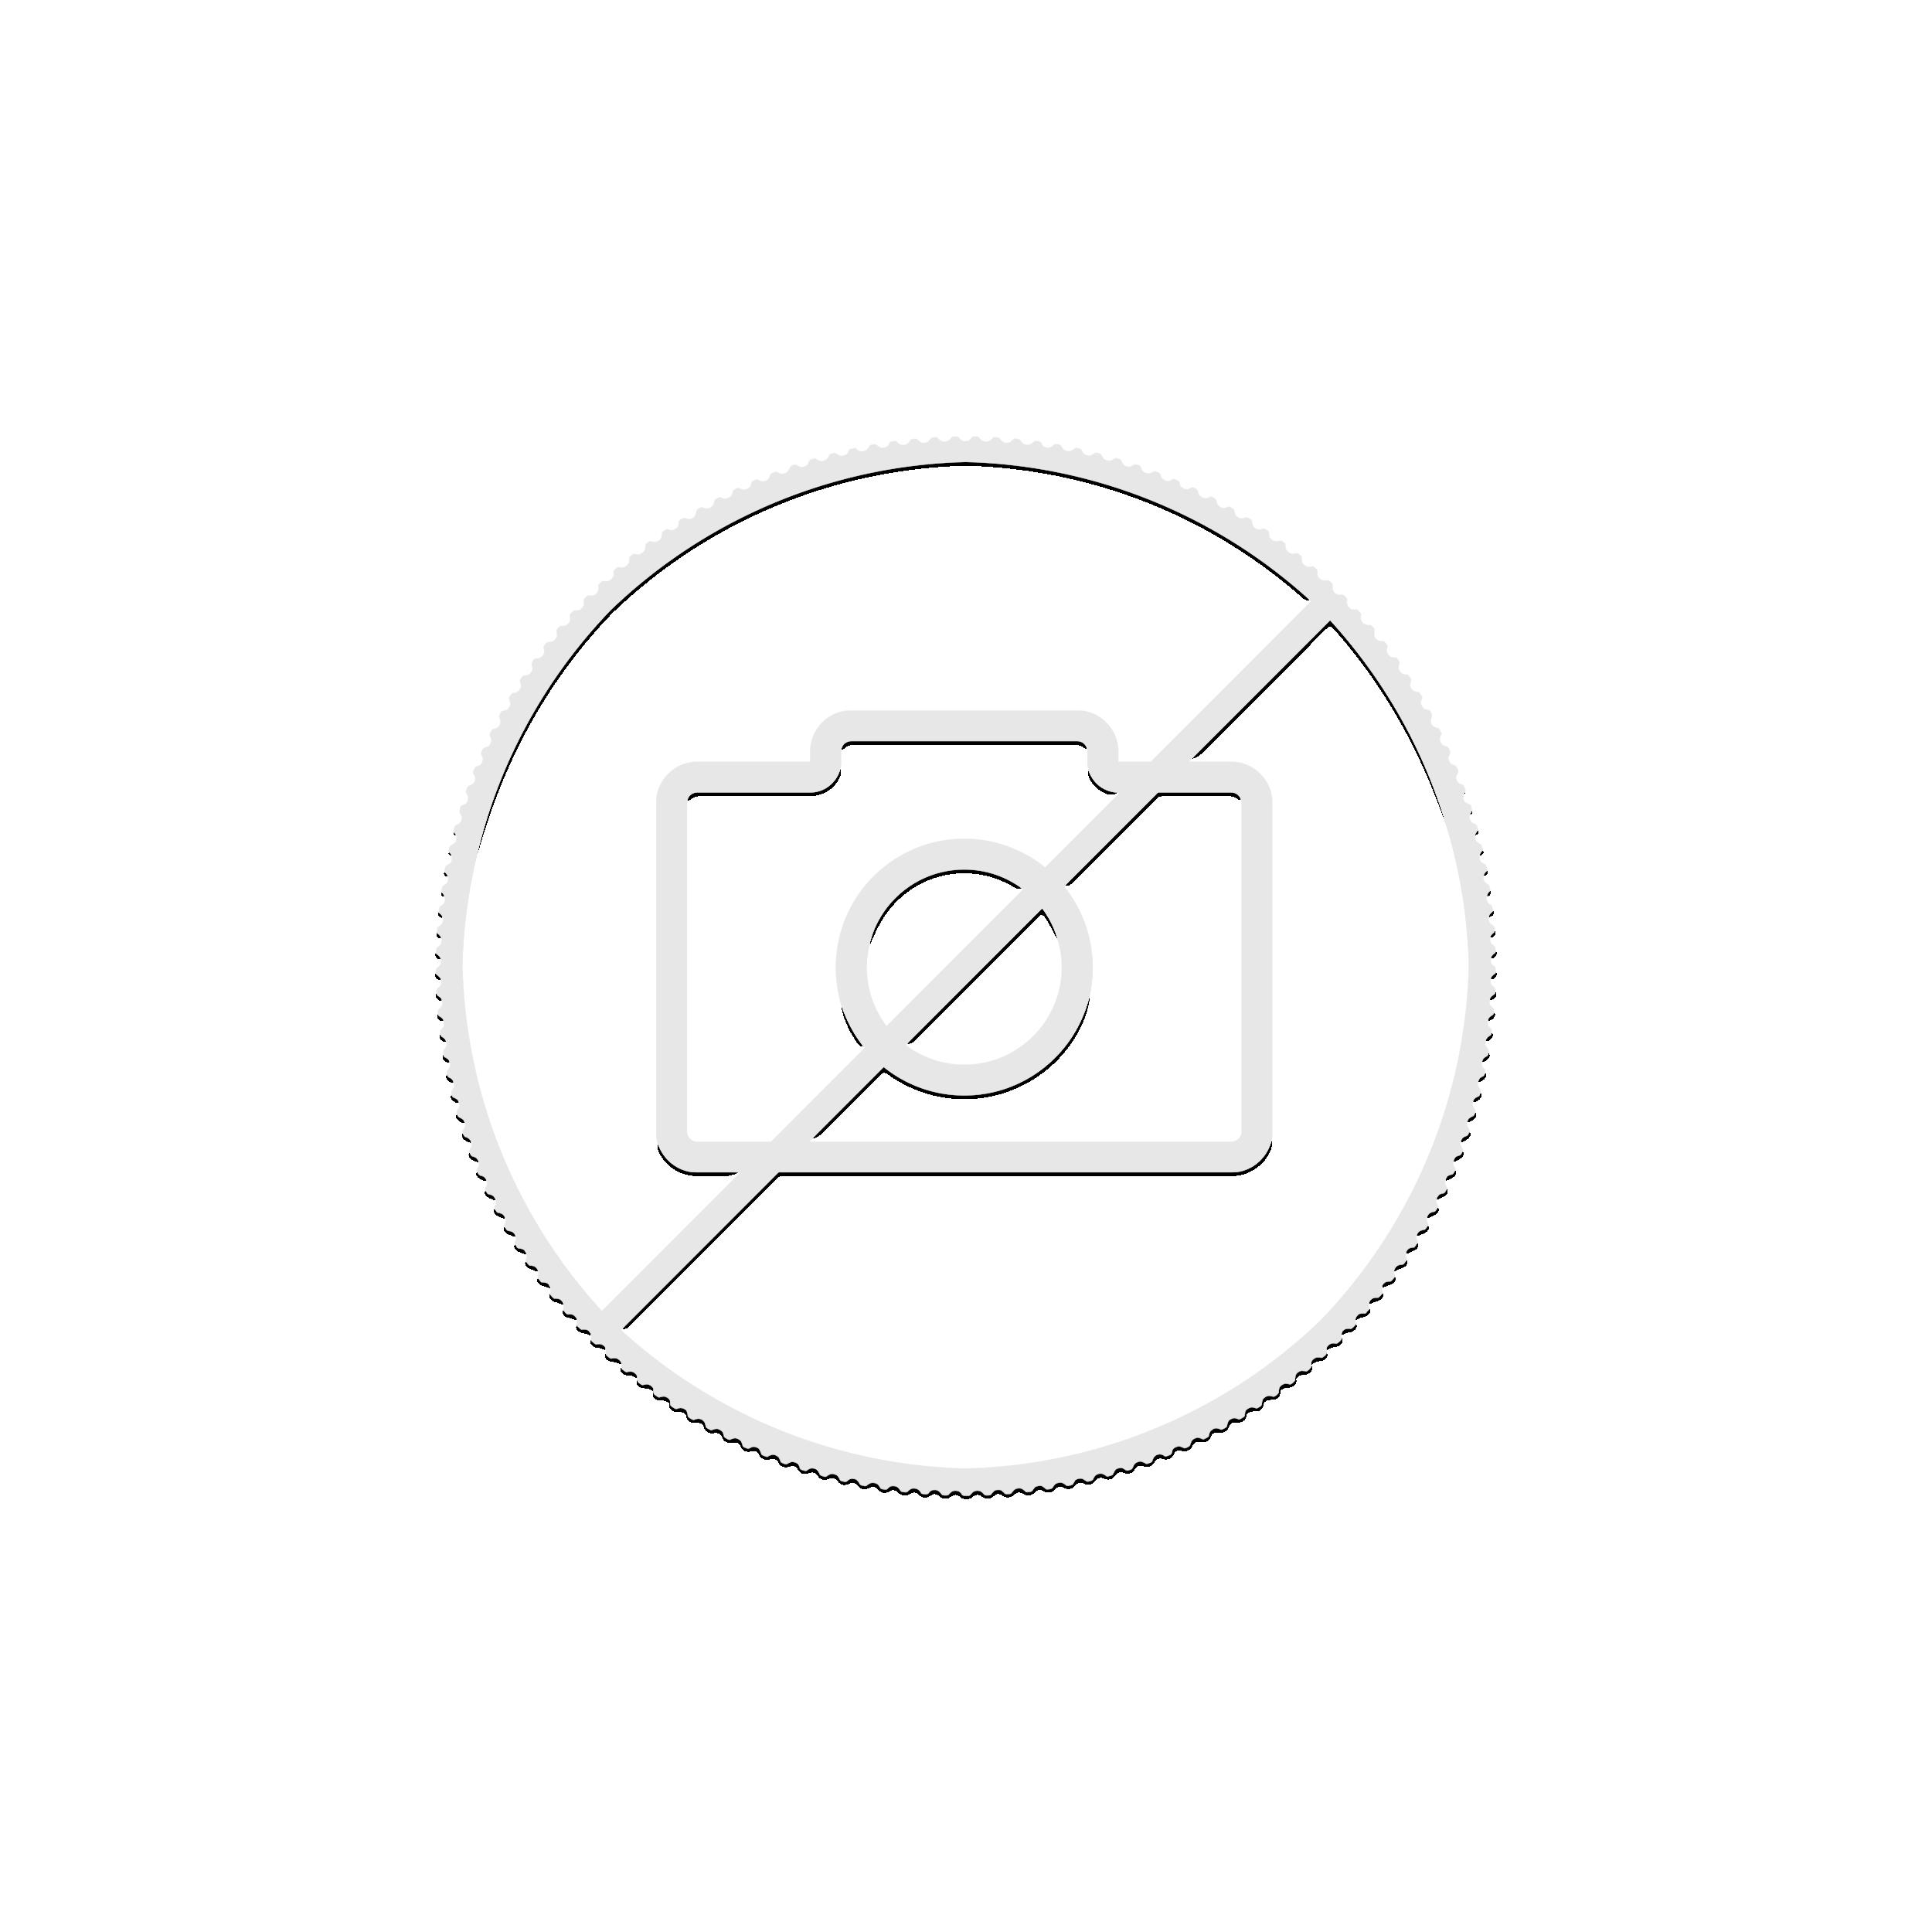 1 troy ounce gouden Lunar munt 2016